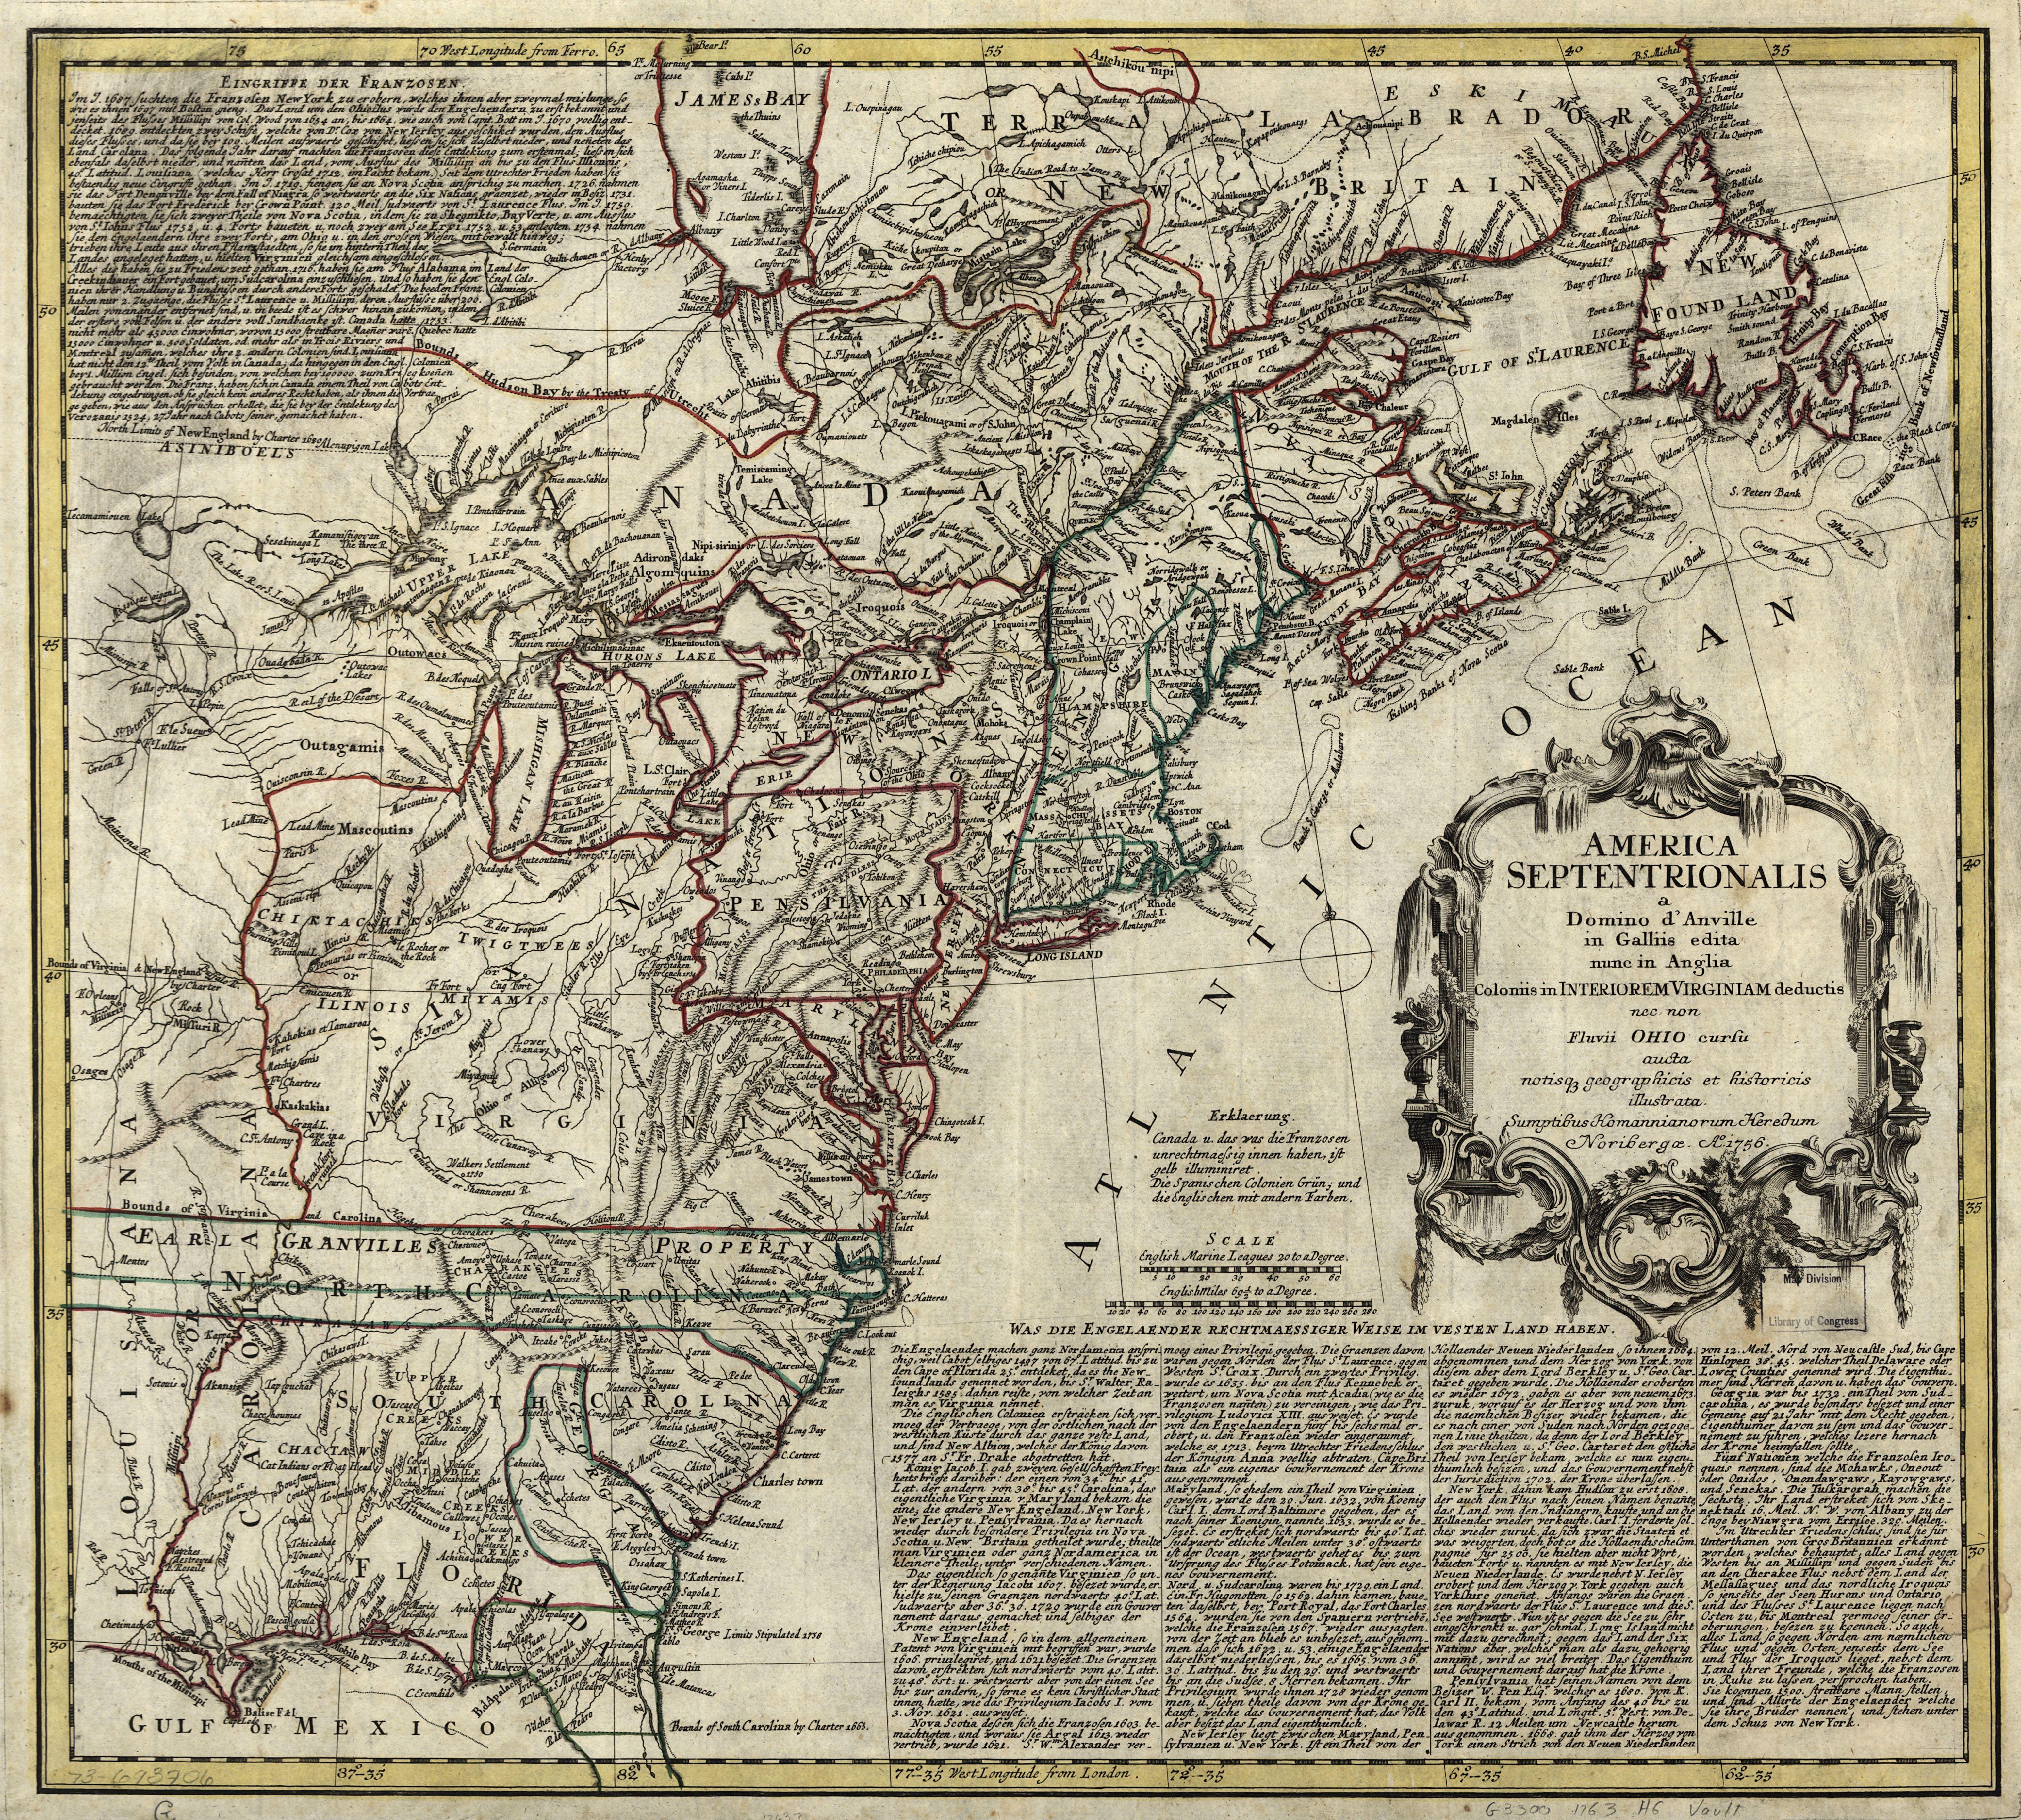 File:America Septentrionalis a Domini d\'Anville in Galliis edita ...